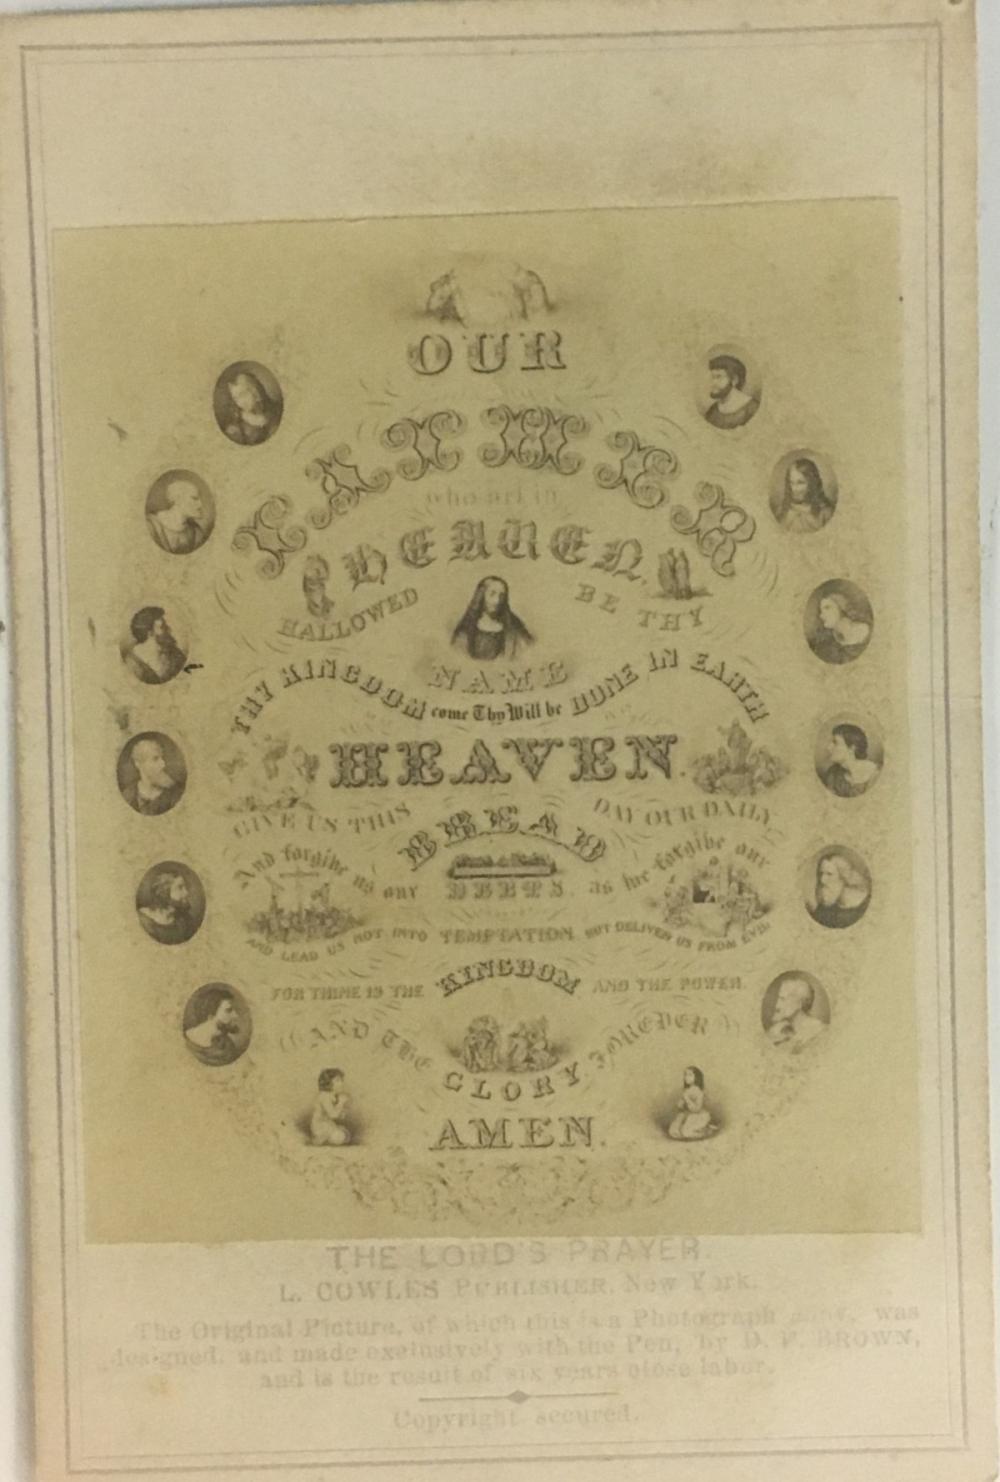 CDV of the Lord's Prayer, 1860s